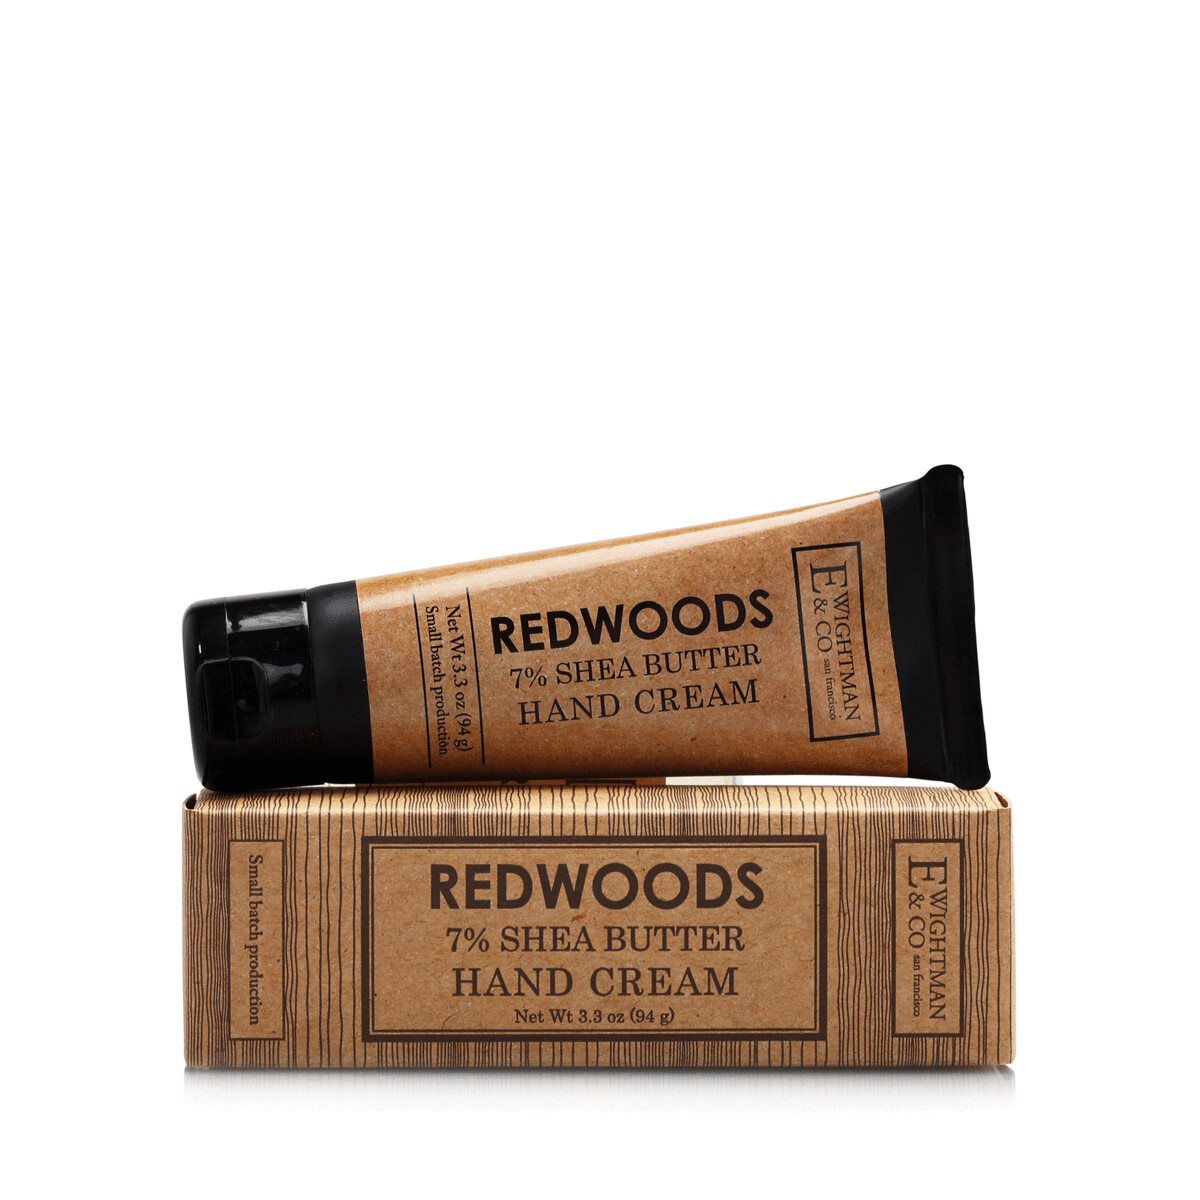 elizabethW - redwoods hand cream